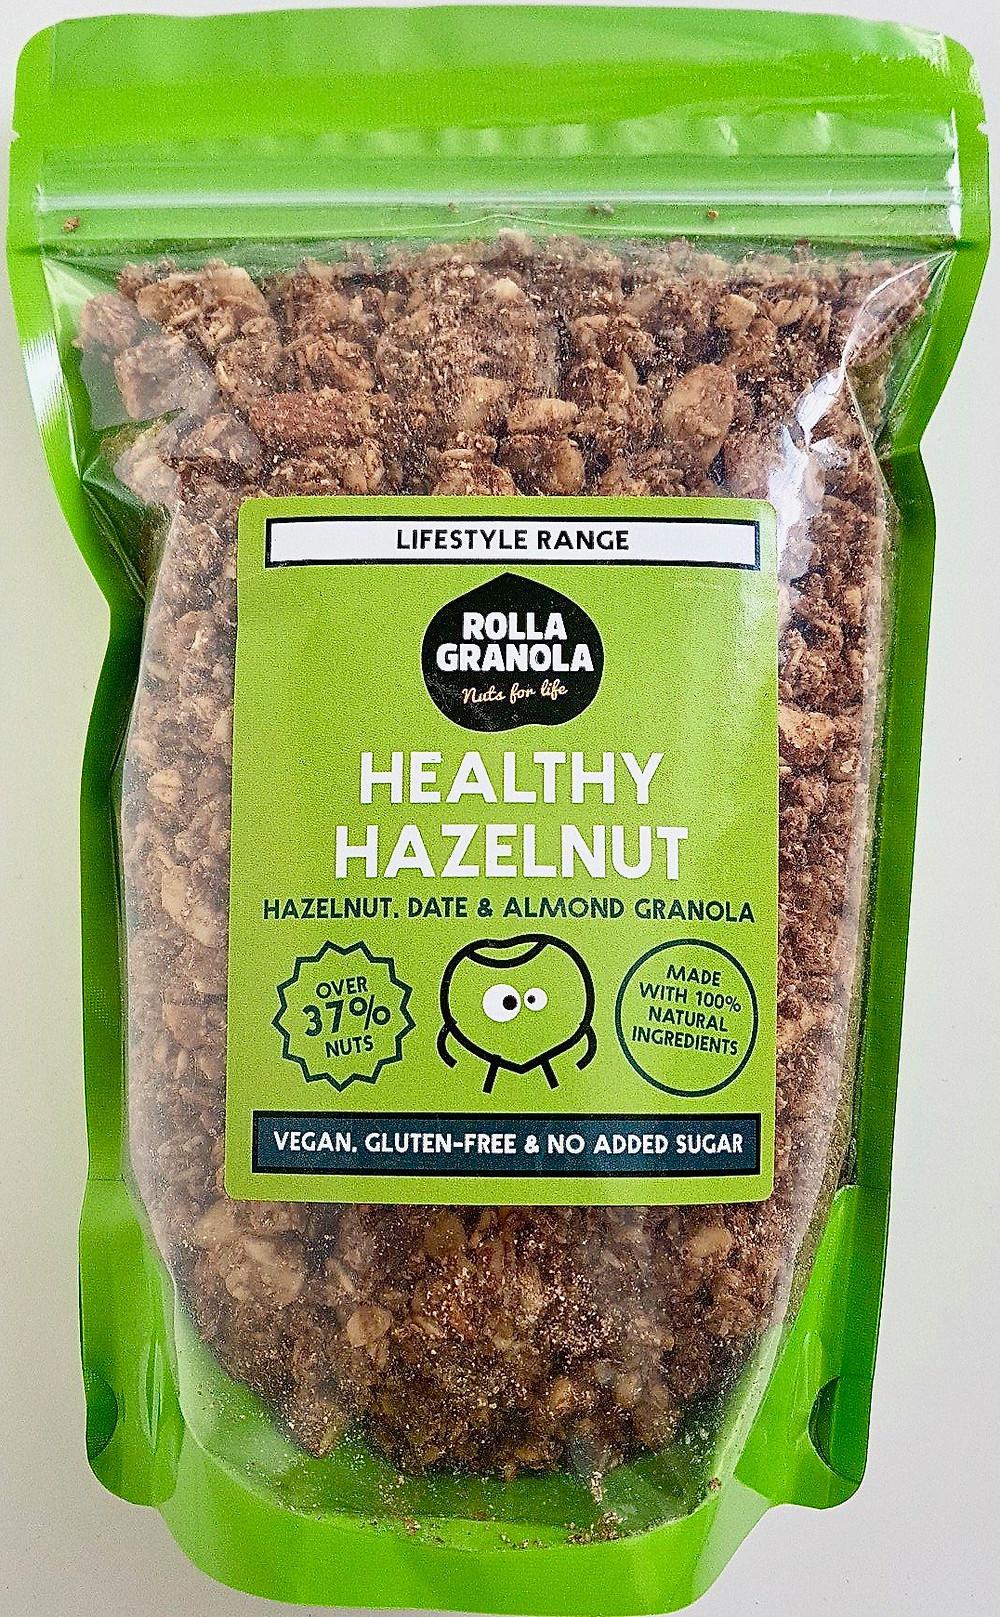 Rollagranola Healthy Hazelnut